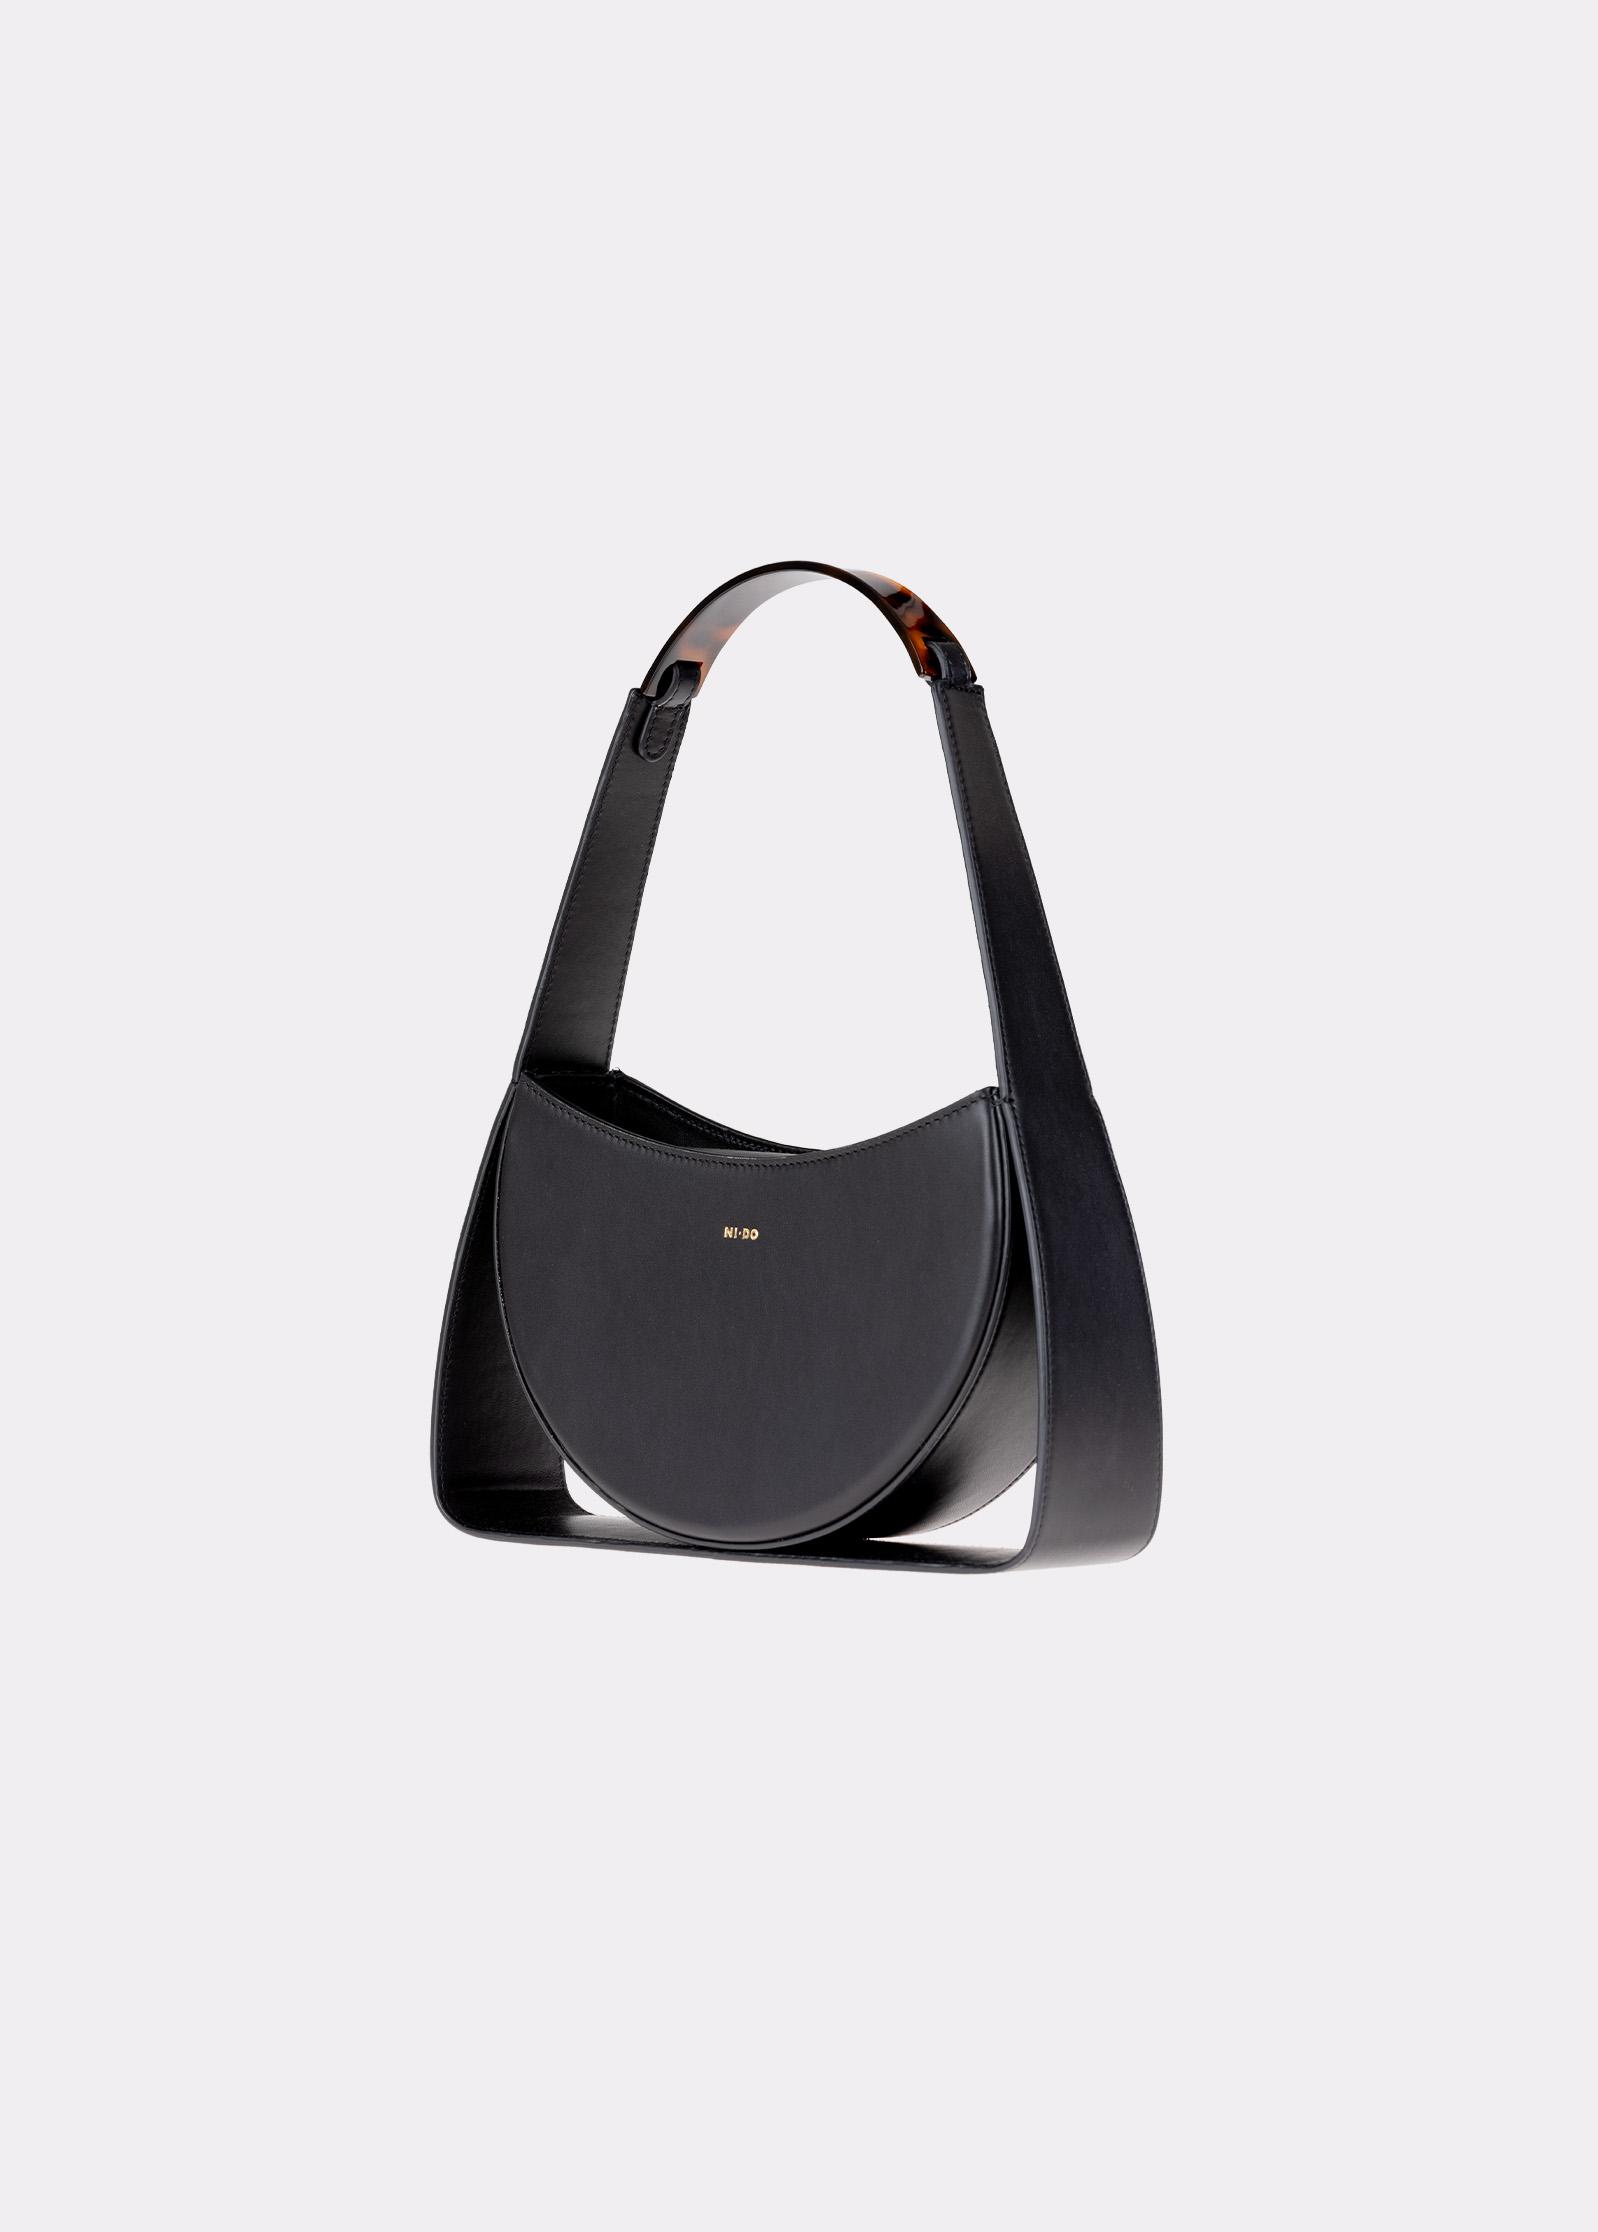 NIDO_Pupilla-bag_black_side